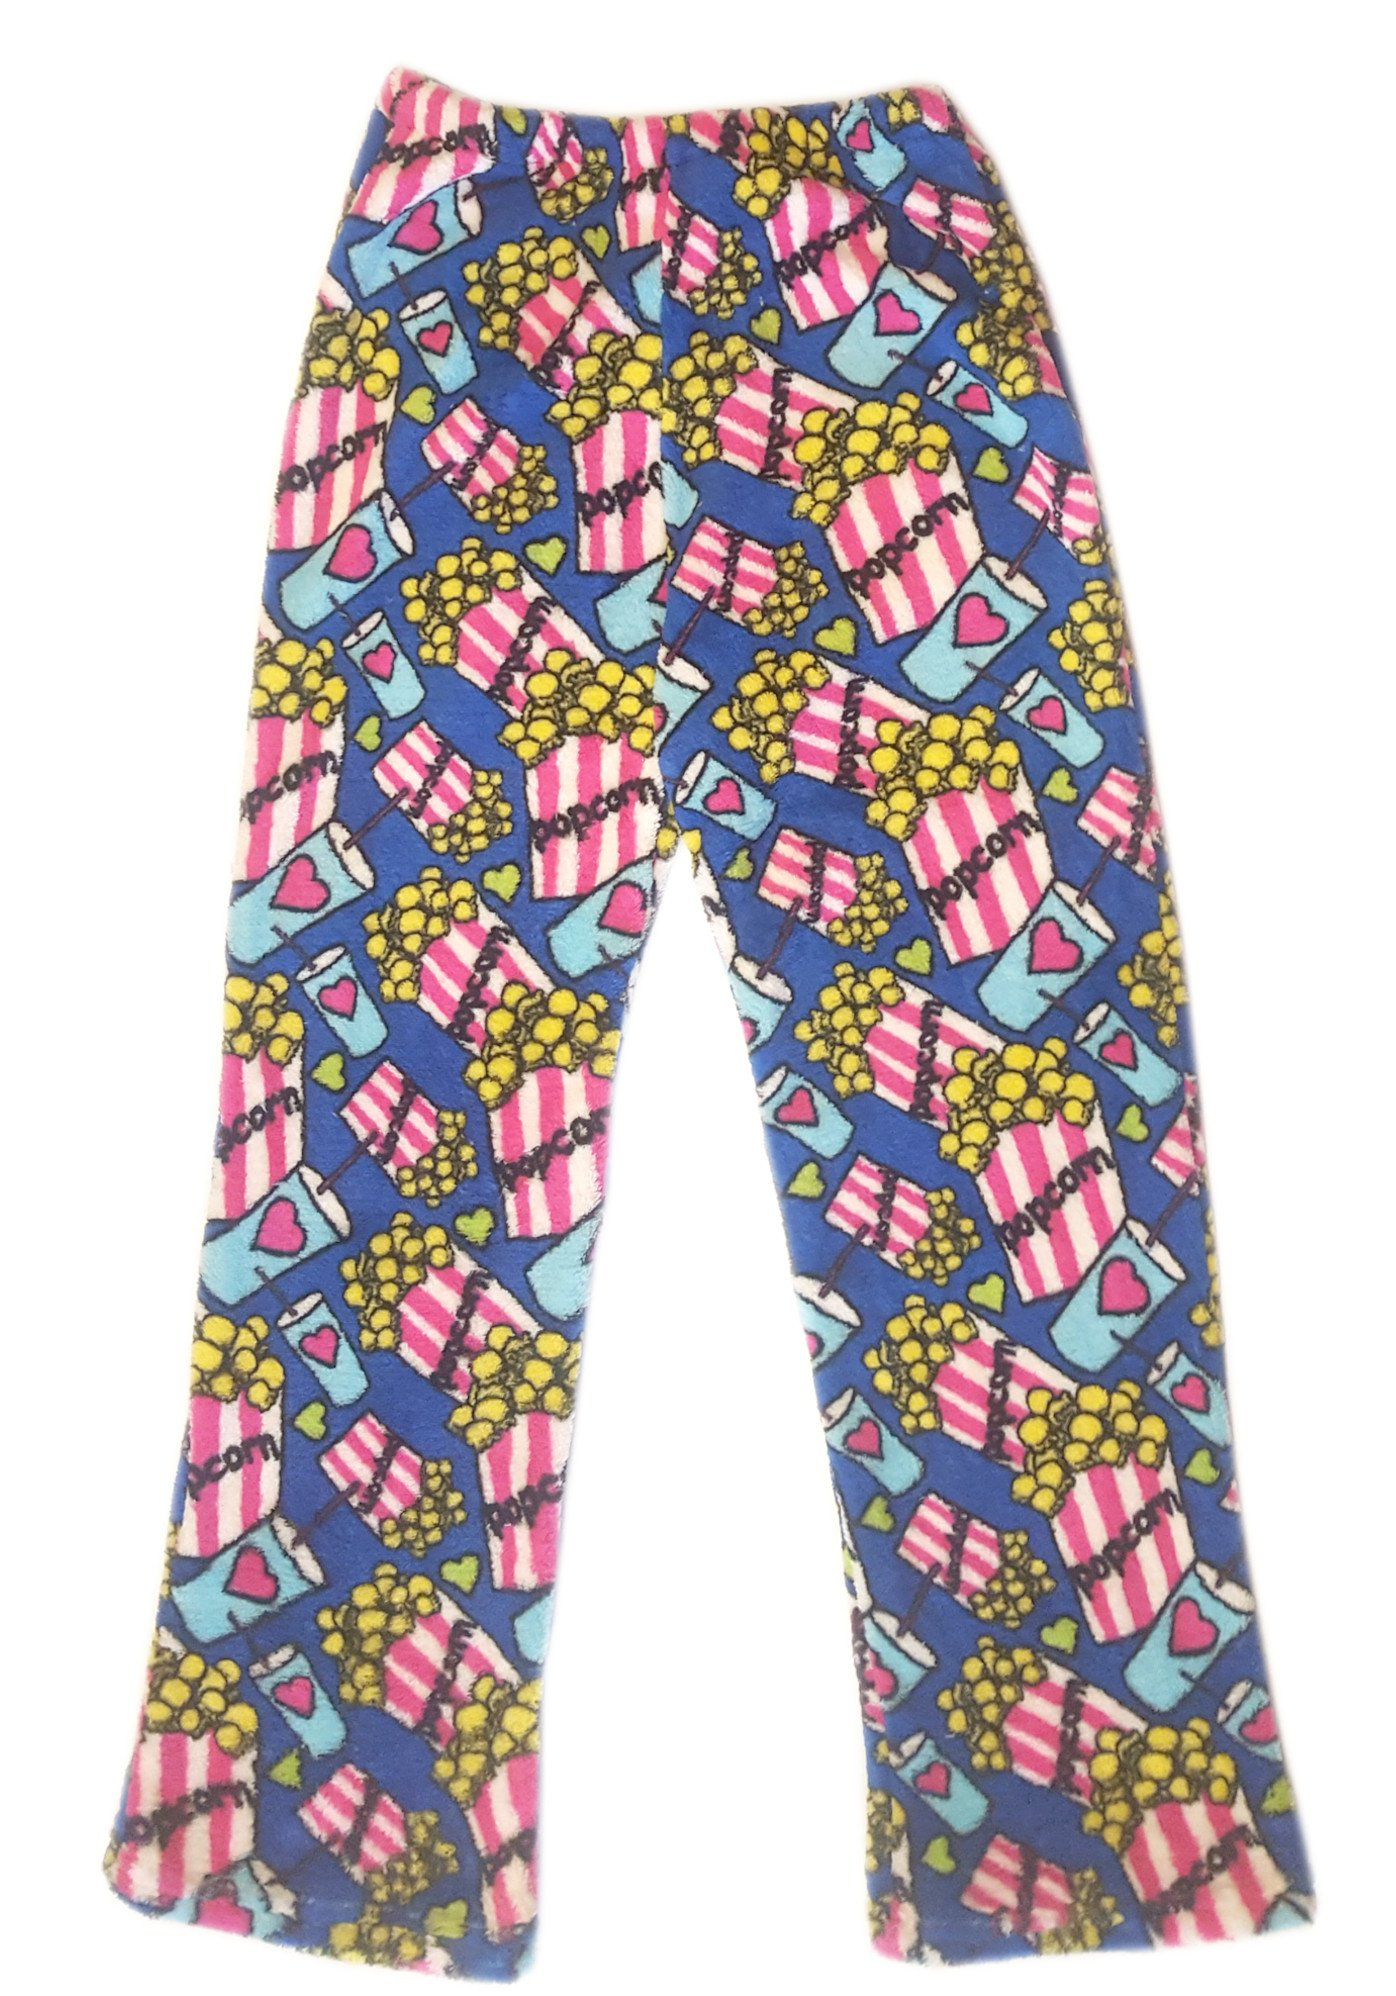 Confetti and Friends Fuzzy Plush Pajama Pants - Popcorn Love - 5/6 by Confetti and Friends (Image #1)